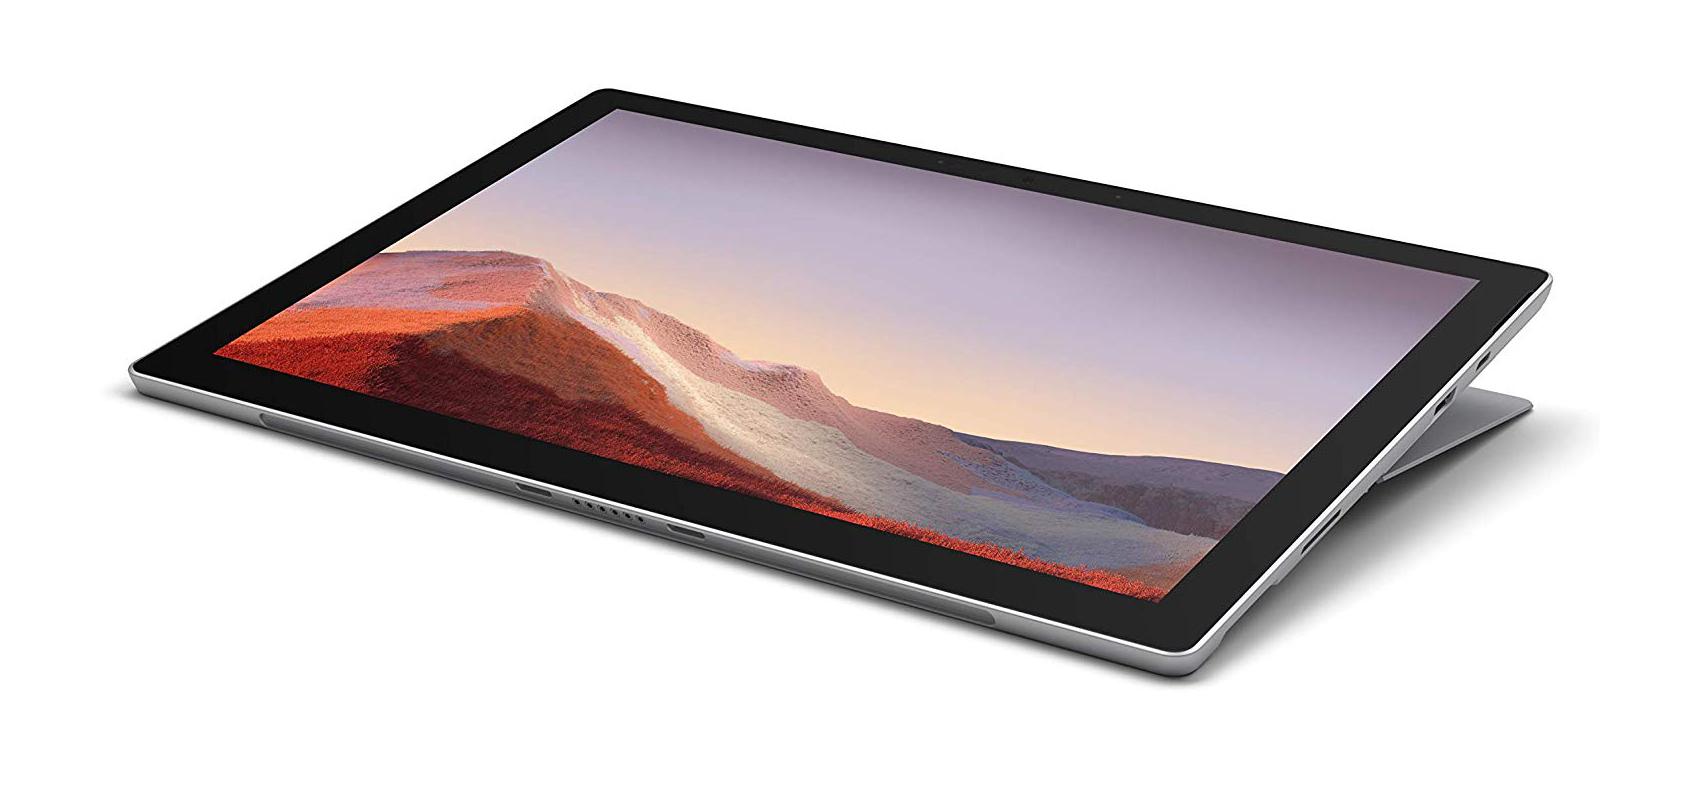 Microsoft Surface Pro 7 - 31,2 cm (12.3 Zoll) - 2736 x 1824 Pixel - 512 GB - 16 GB - Windows 10 Home - Platin